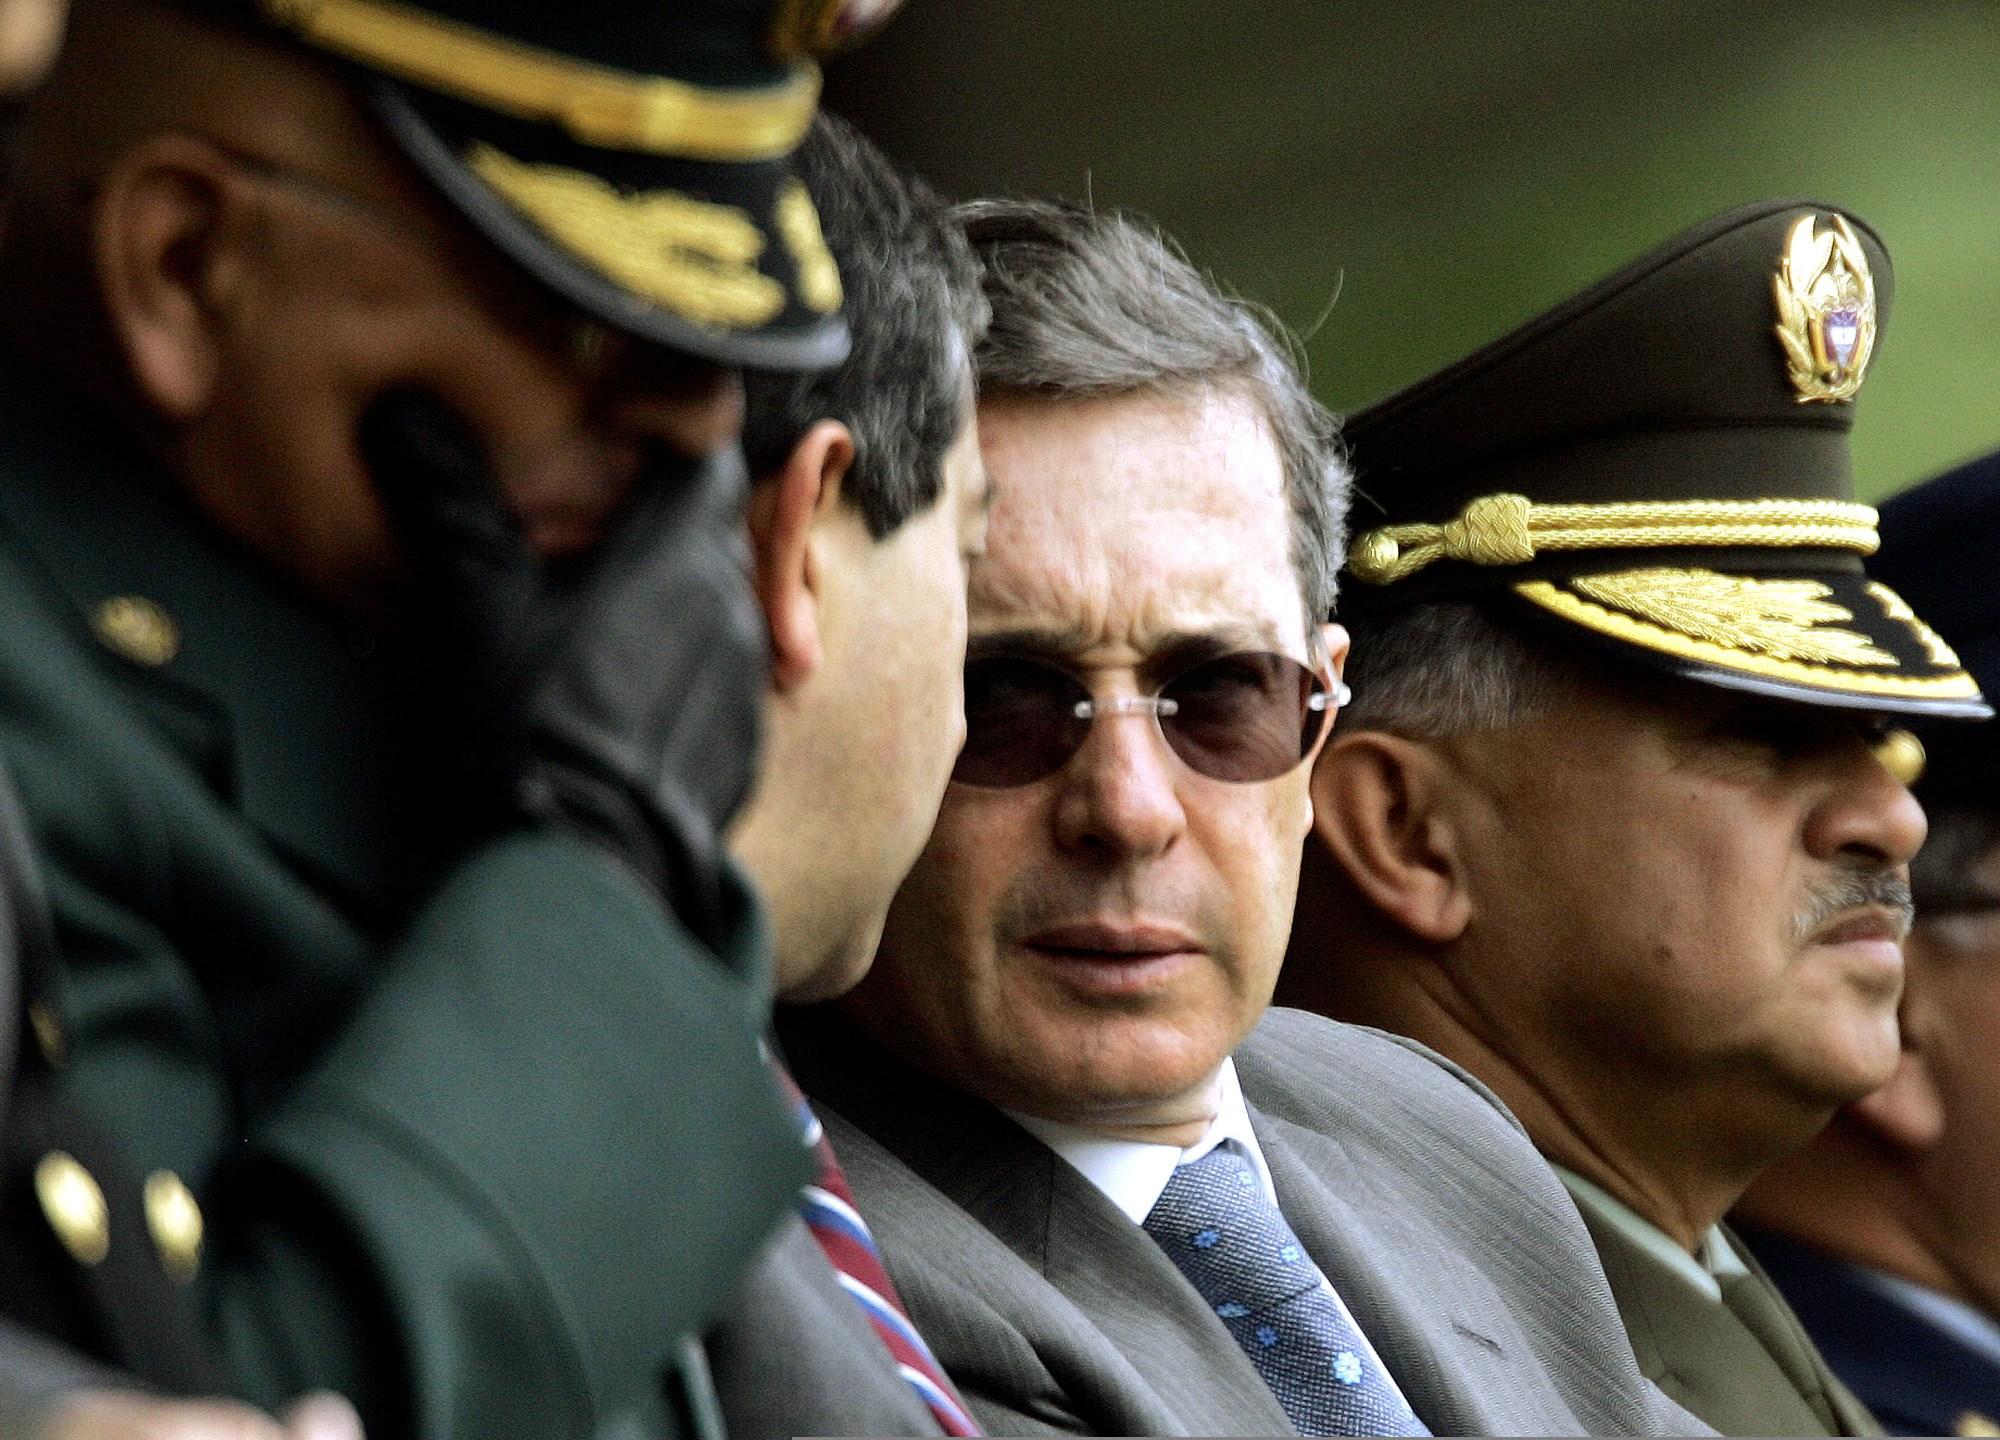 Alvaro Uribe, Camilo Ospina